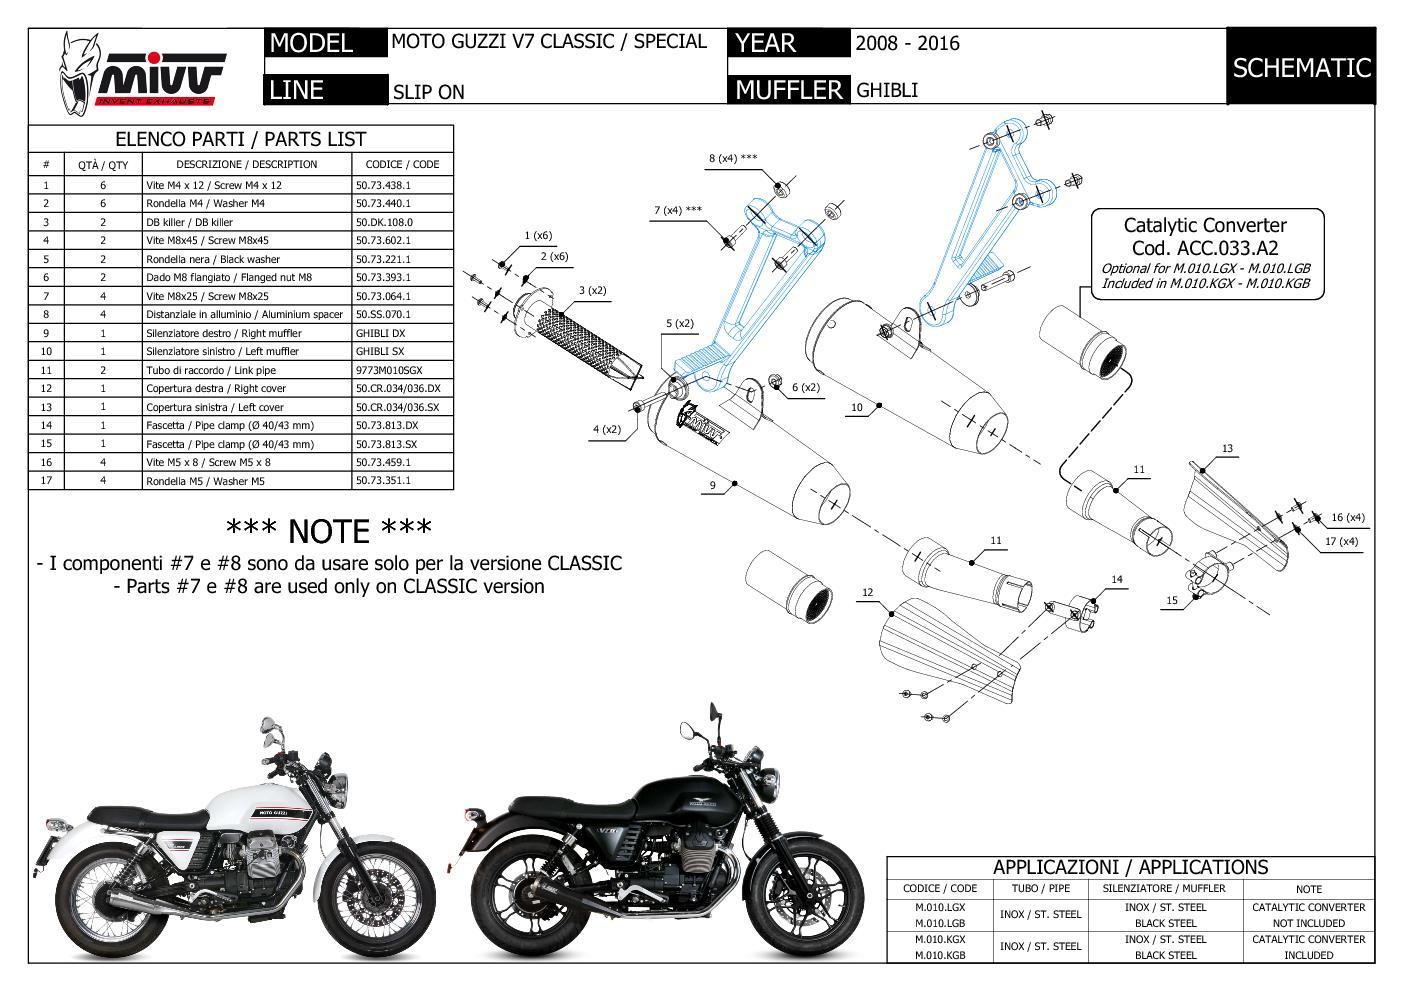 Mivv Exhaust Mufflers Ghibli Black for Moto Guzzi V7